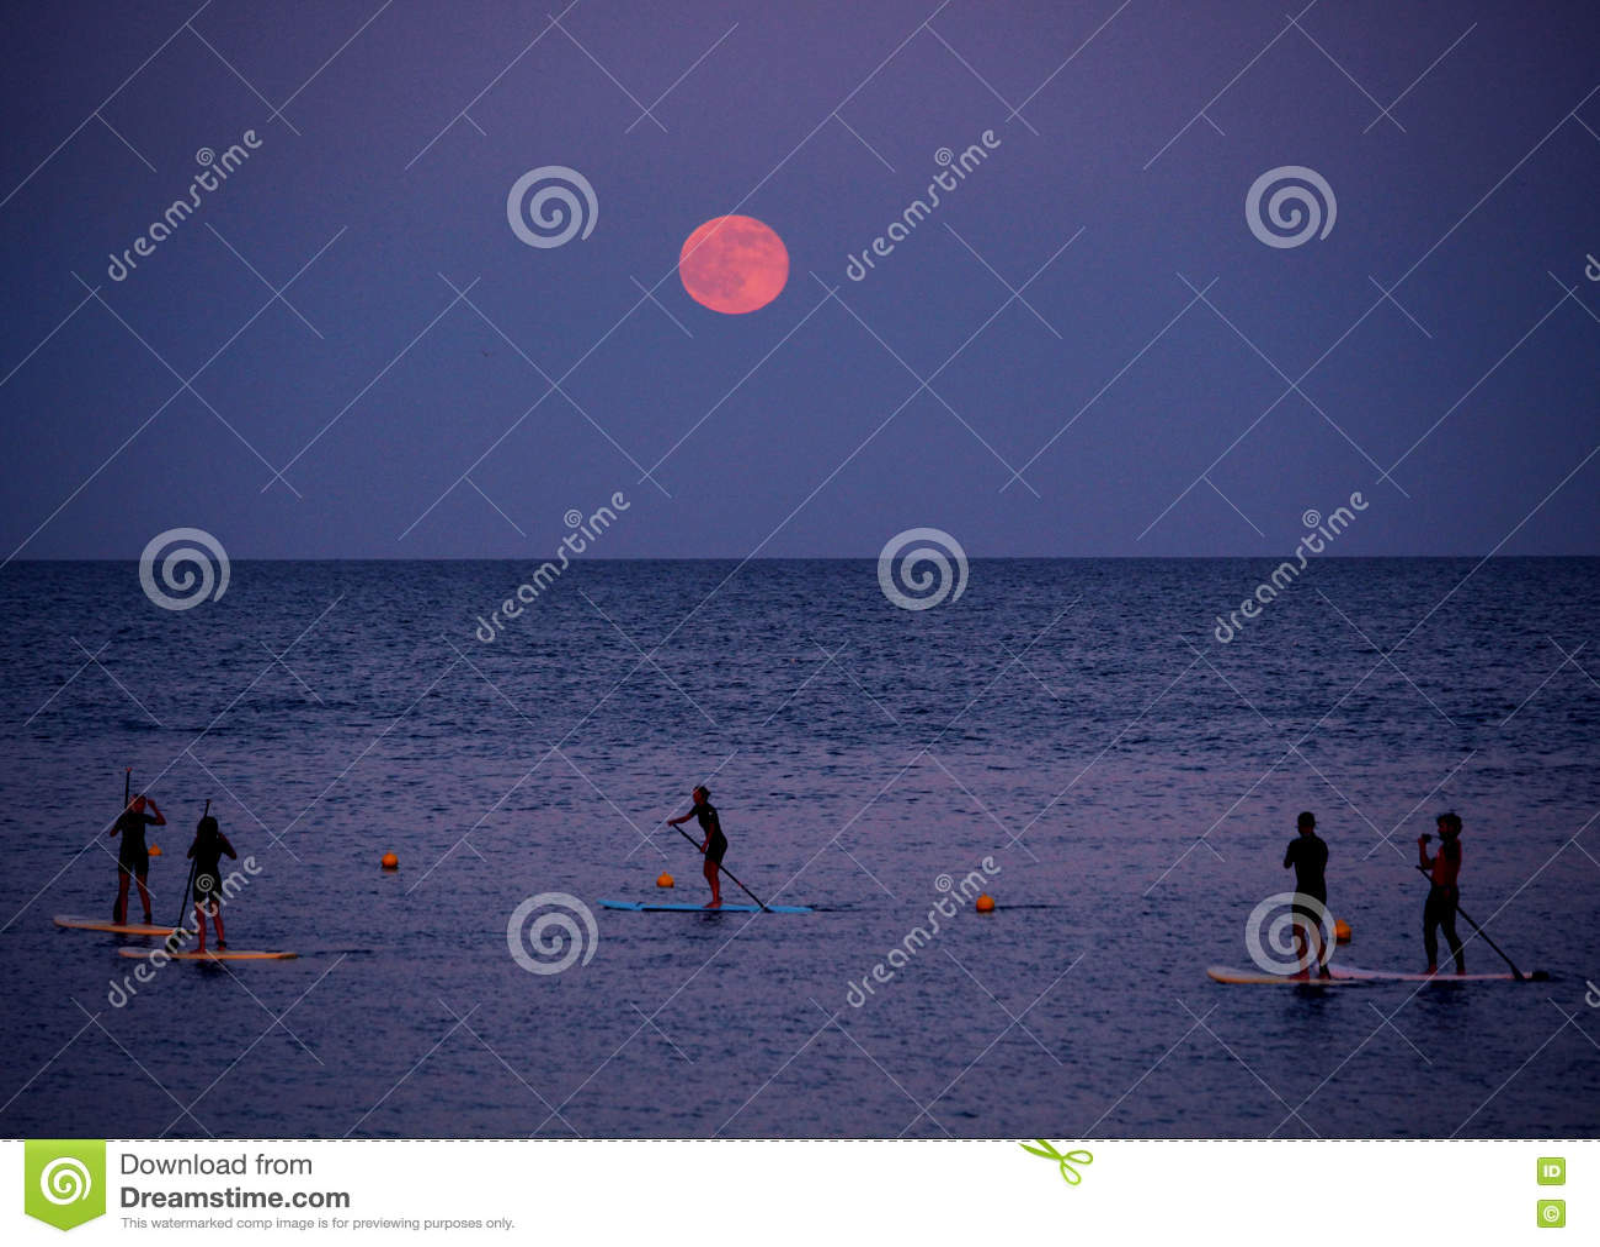 直立paddleboarding在满月下